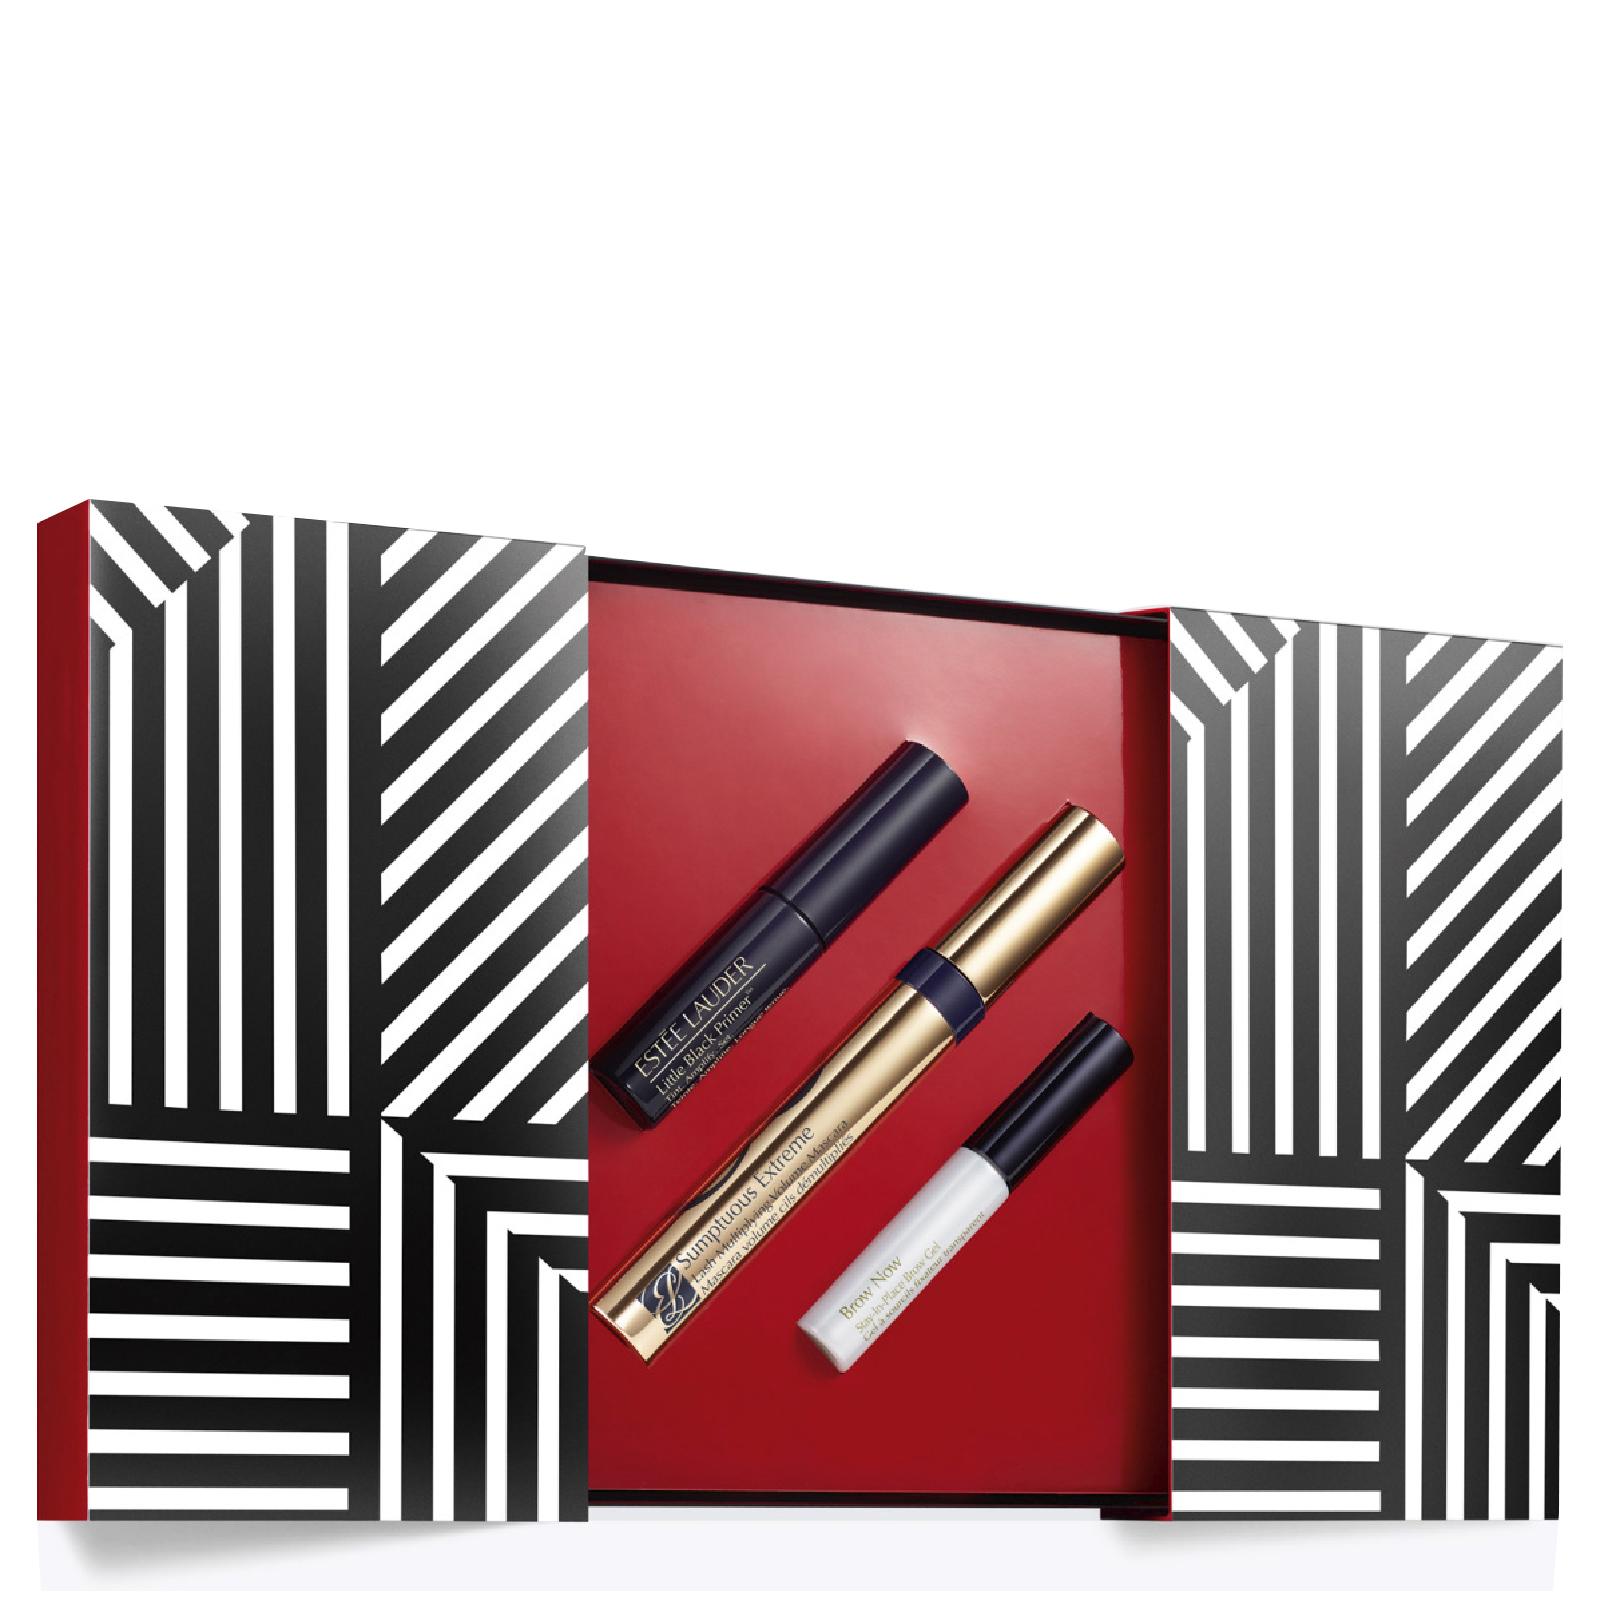 49f4e483add Estée Lauder Sumptuous Extreme Mascara Gift Set | Free Shipping ...